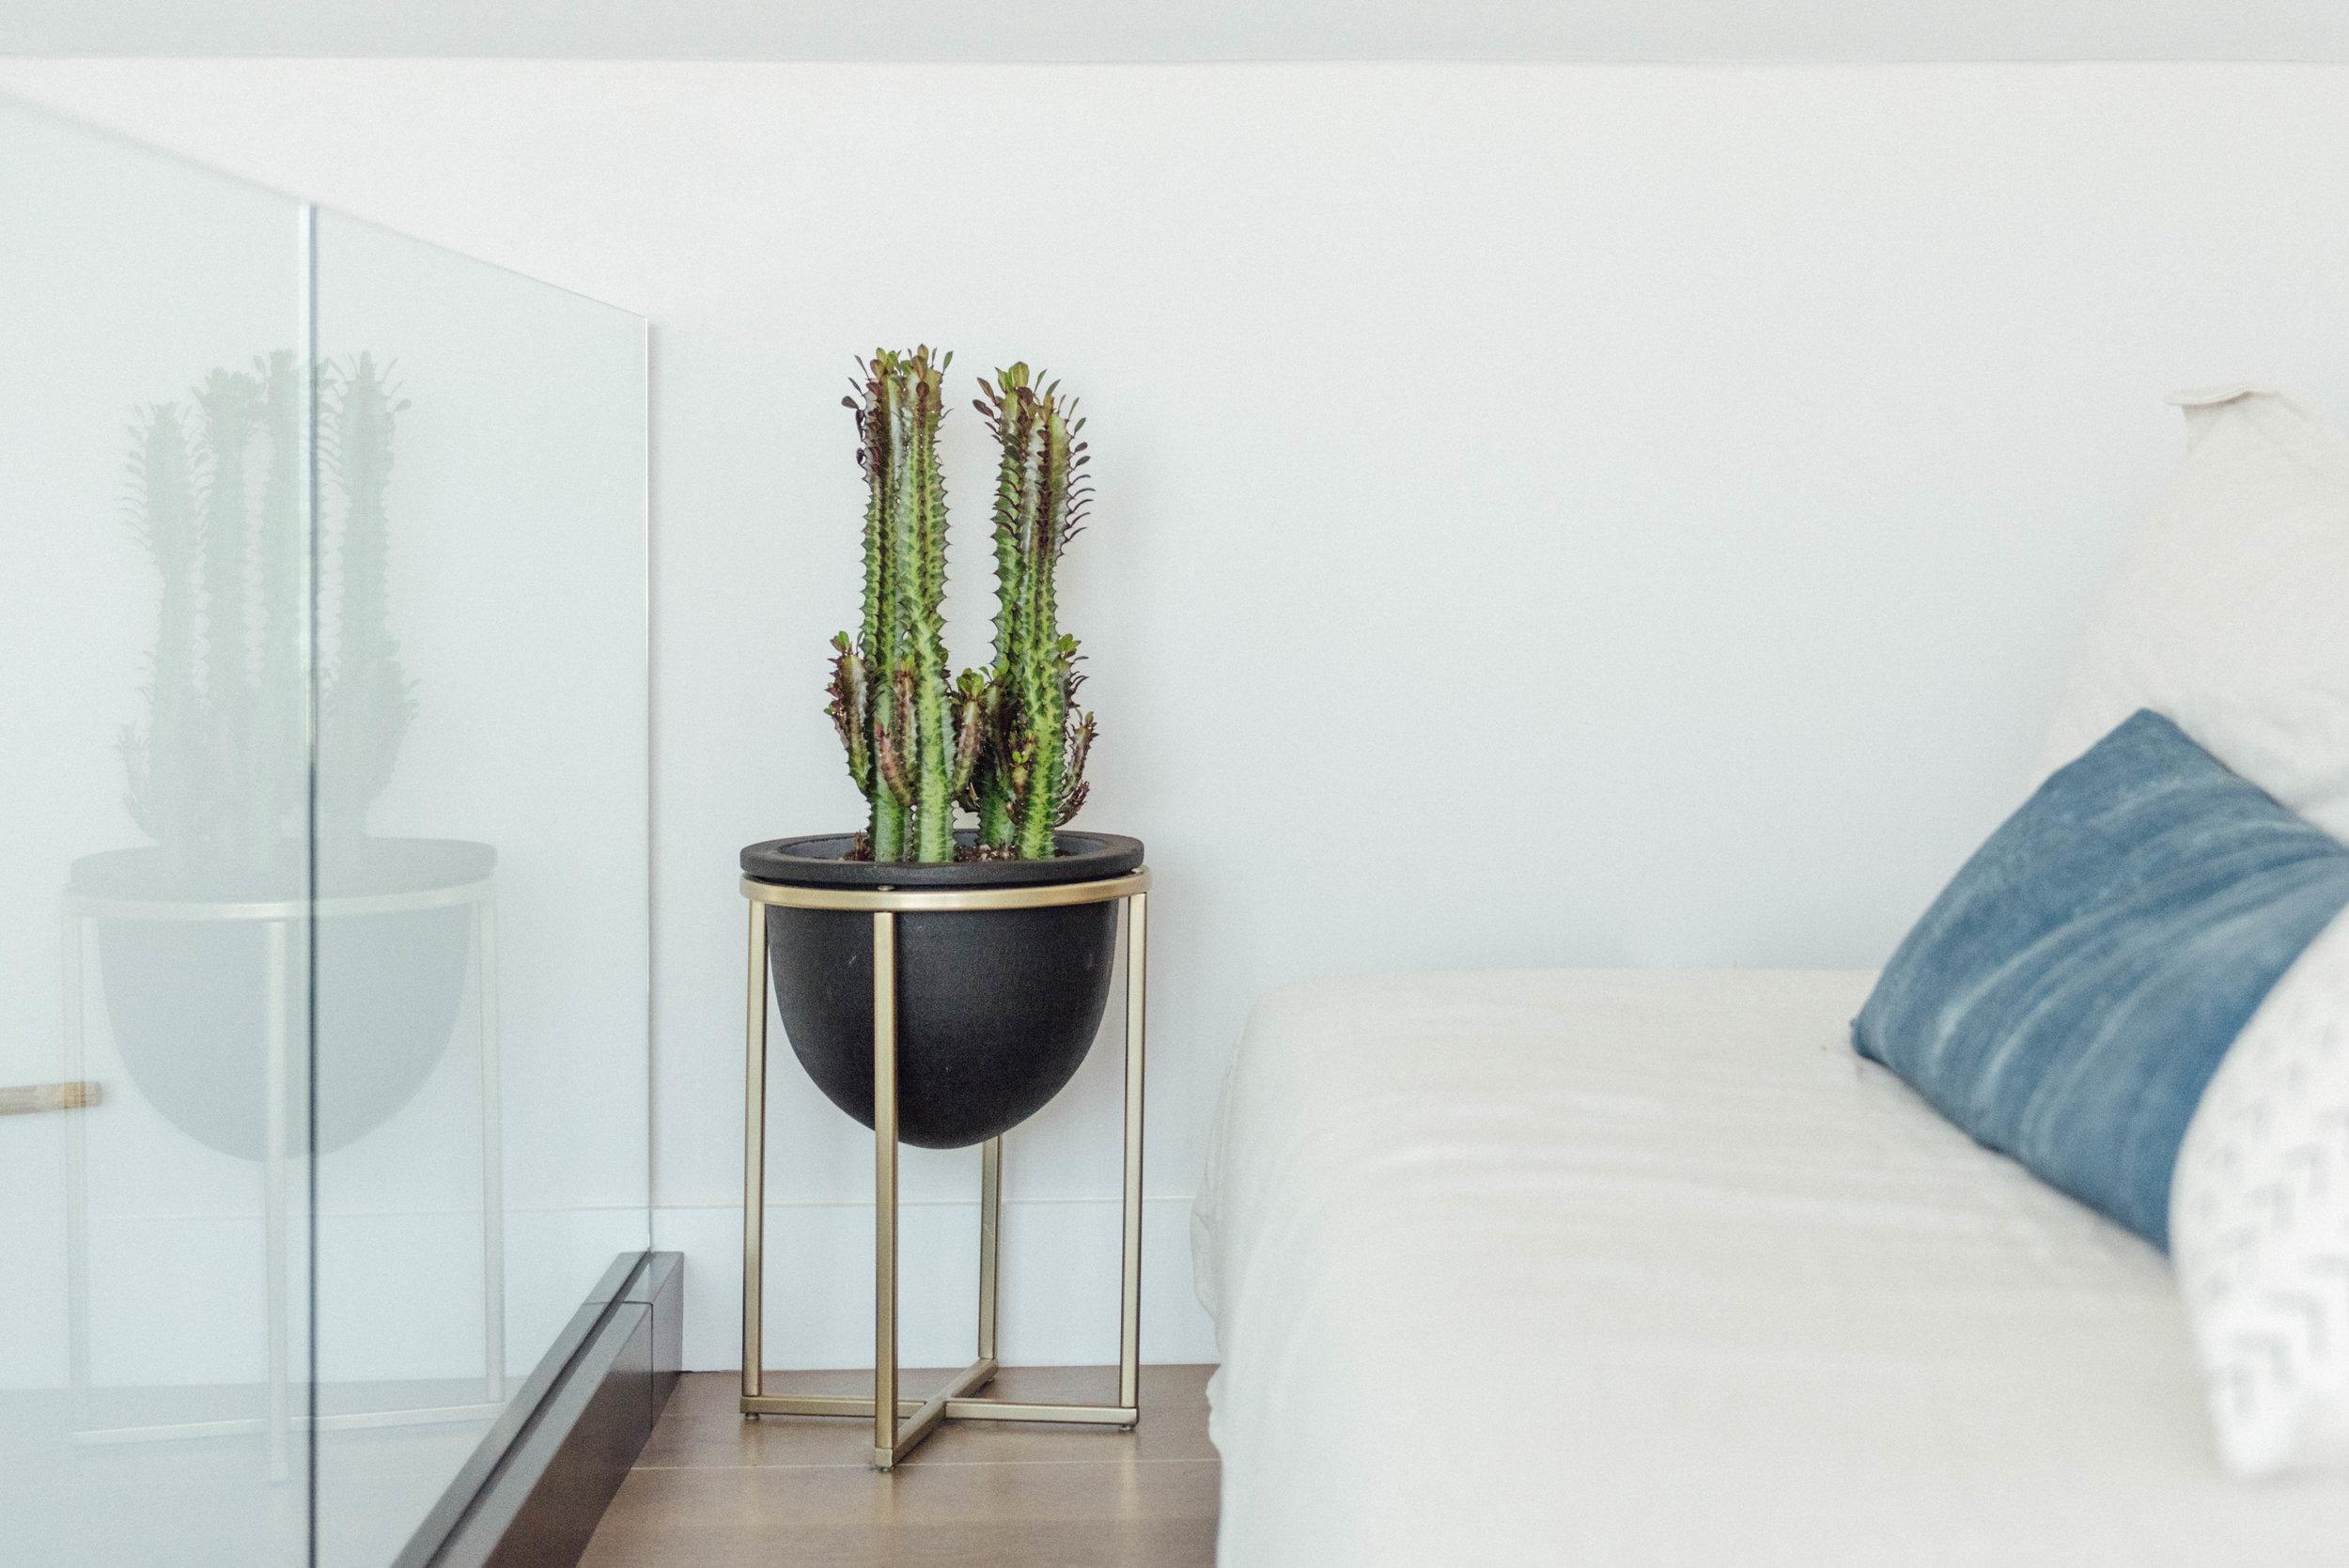 interior_plants-3.jpg